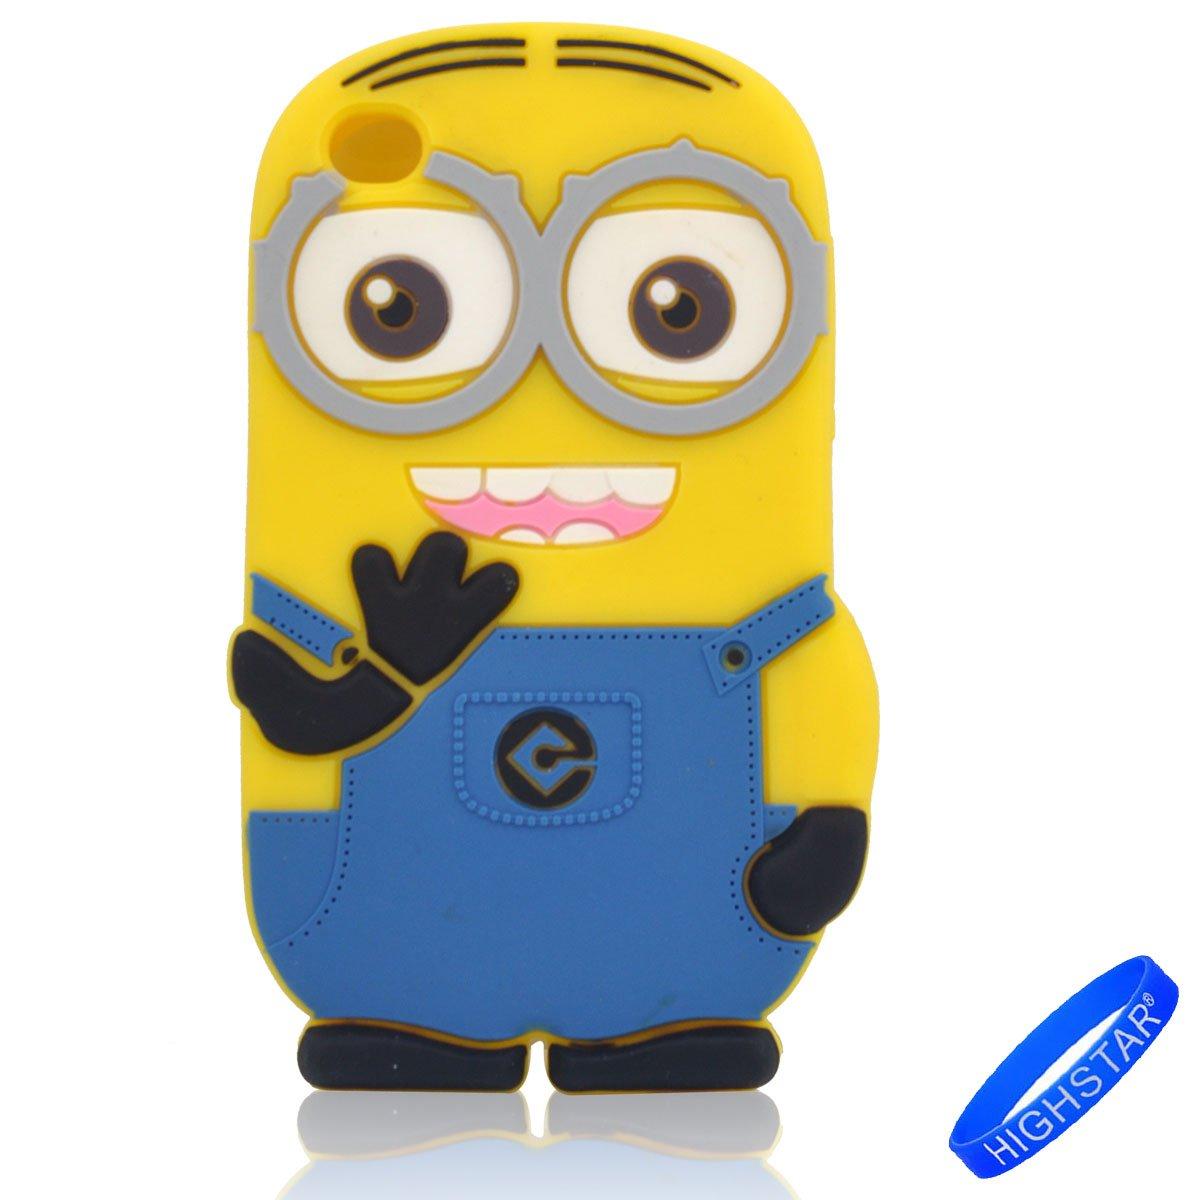 4g iTouch Cuarta Generacion 2 dos ojos Minion Minions Robinhood99 Funda Carcasa de Silicona para Apple iPod Touch 4 4th